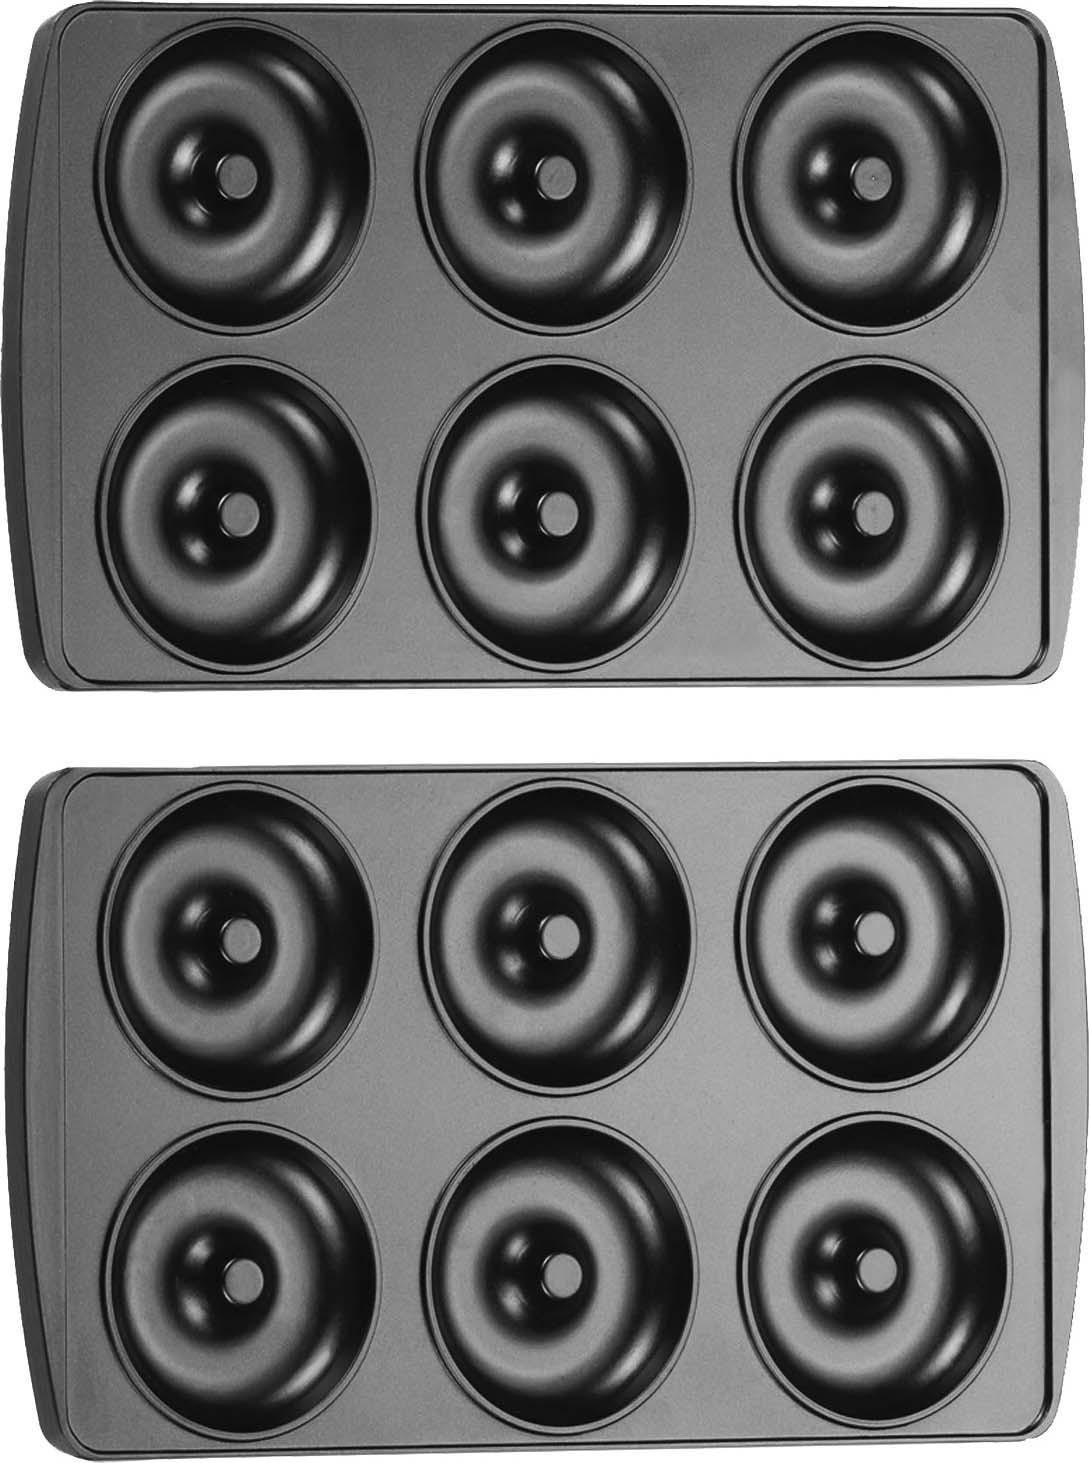 Redmond RAMB-05 Пончики панель для мультипекаря multibaker redmond rmb m6011